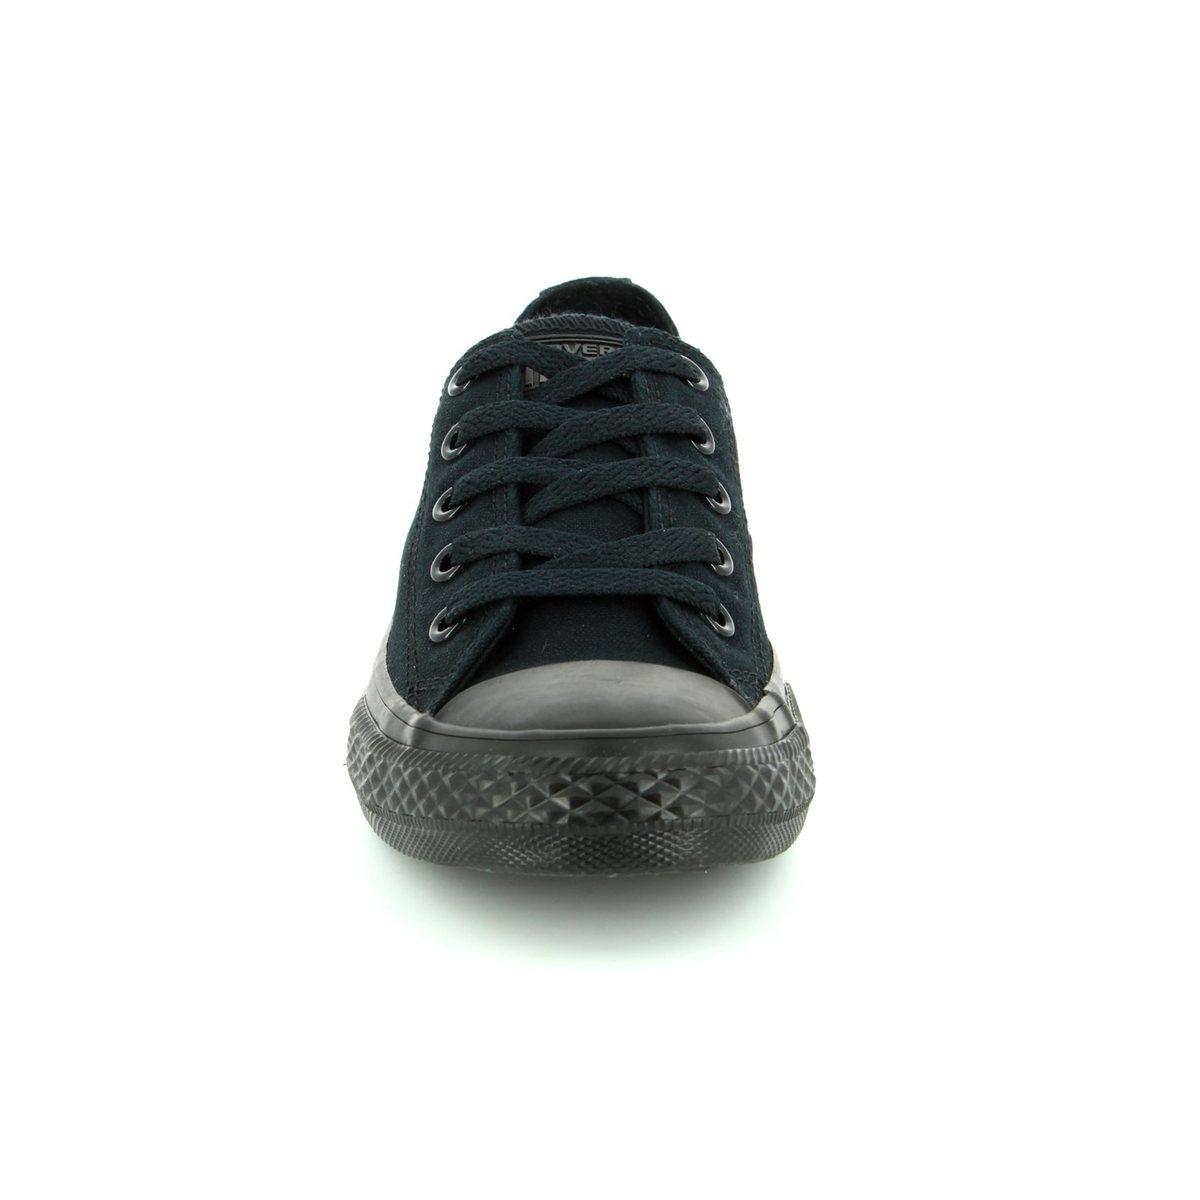 7be39df5b40b Converse Trainers - Black - 314786C All Star Ox Black Monochrome